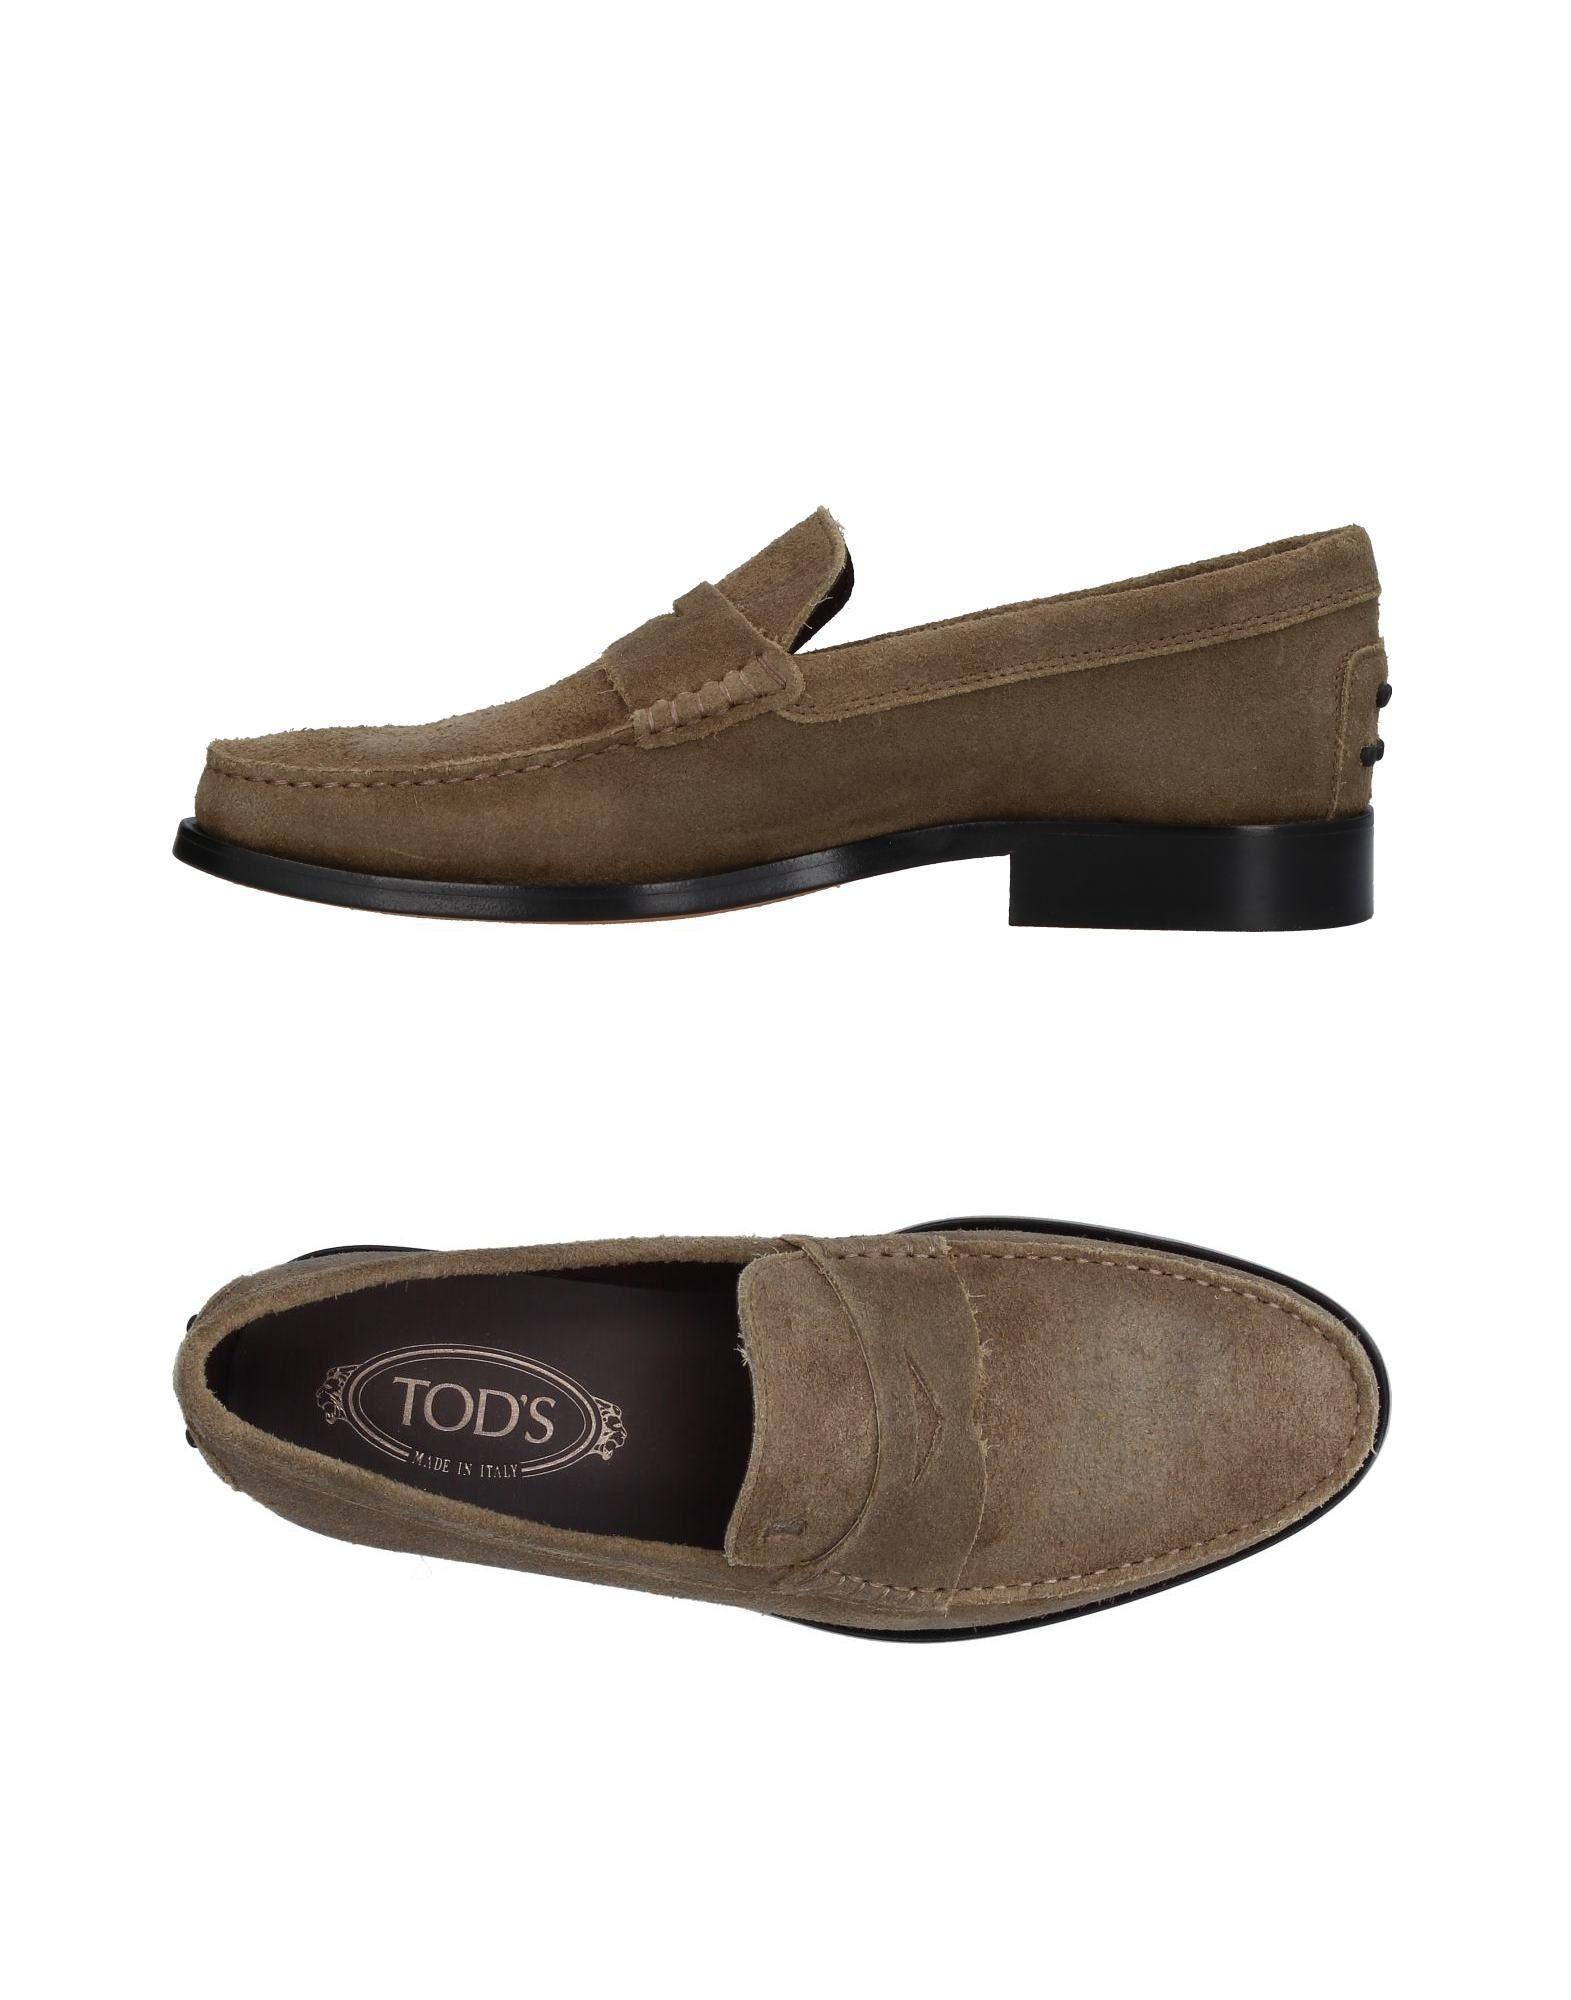 Tod's Mokassins Herren  11310728GP Gute Qualität beliebte Schuhe